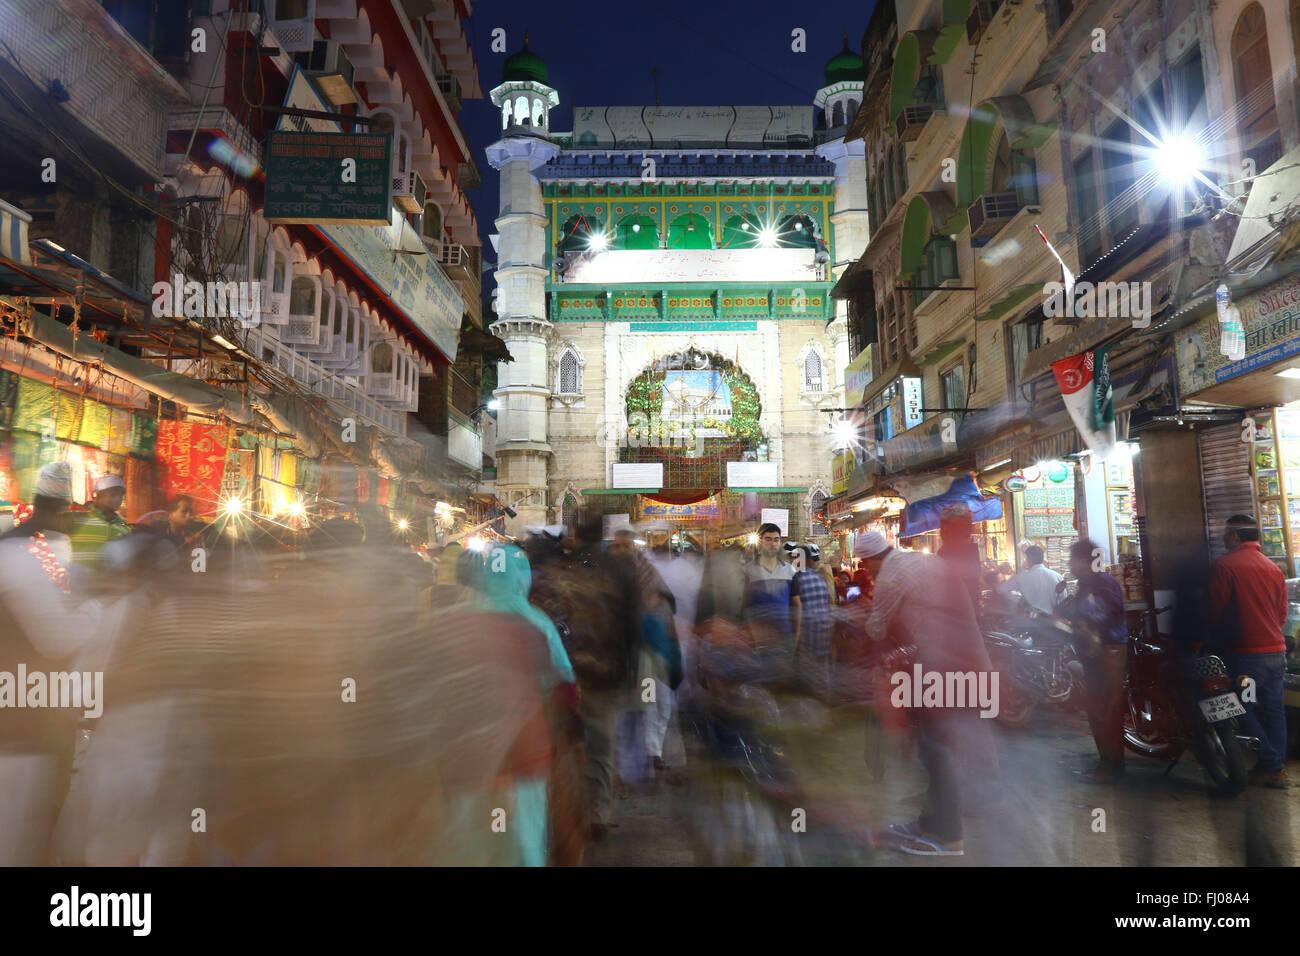 Khwaja moinuddin chishti stock photos khwaja moinuddin chishti nizam gate at dargah tomb of sufi saint hazrat khwaja gharib altavistaventures Choice Image